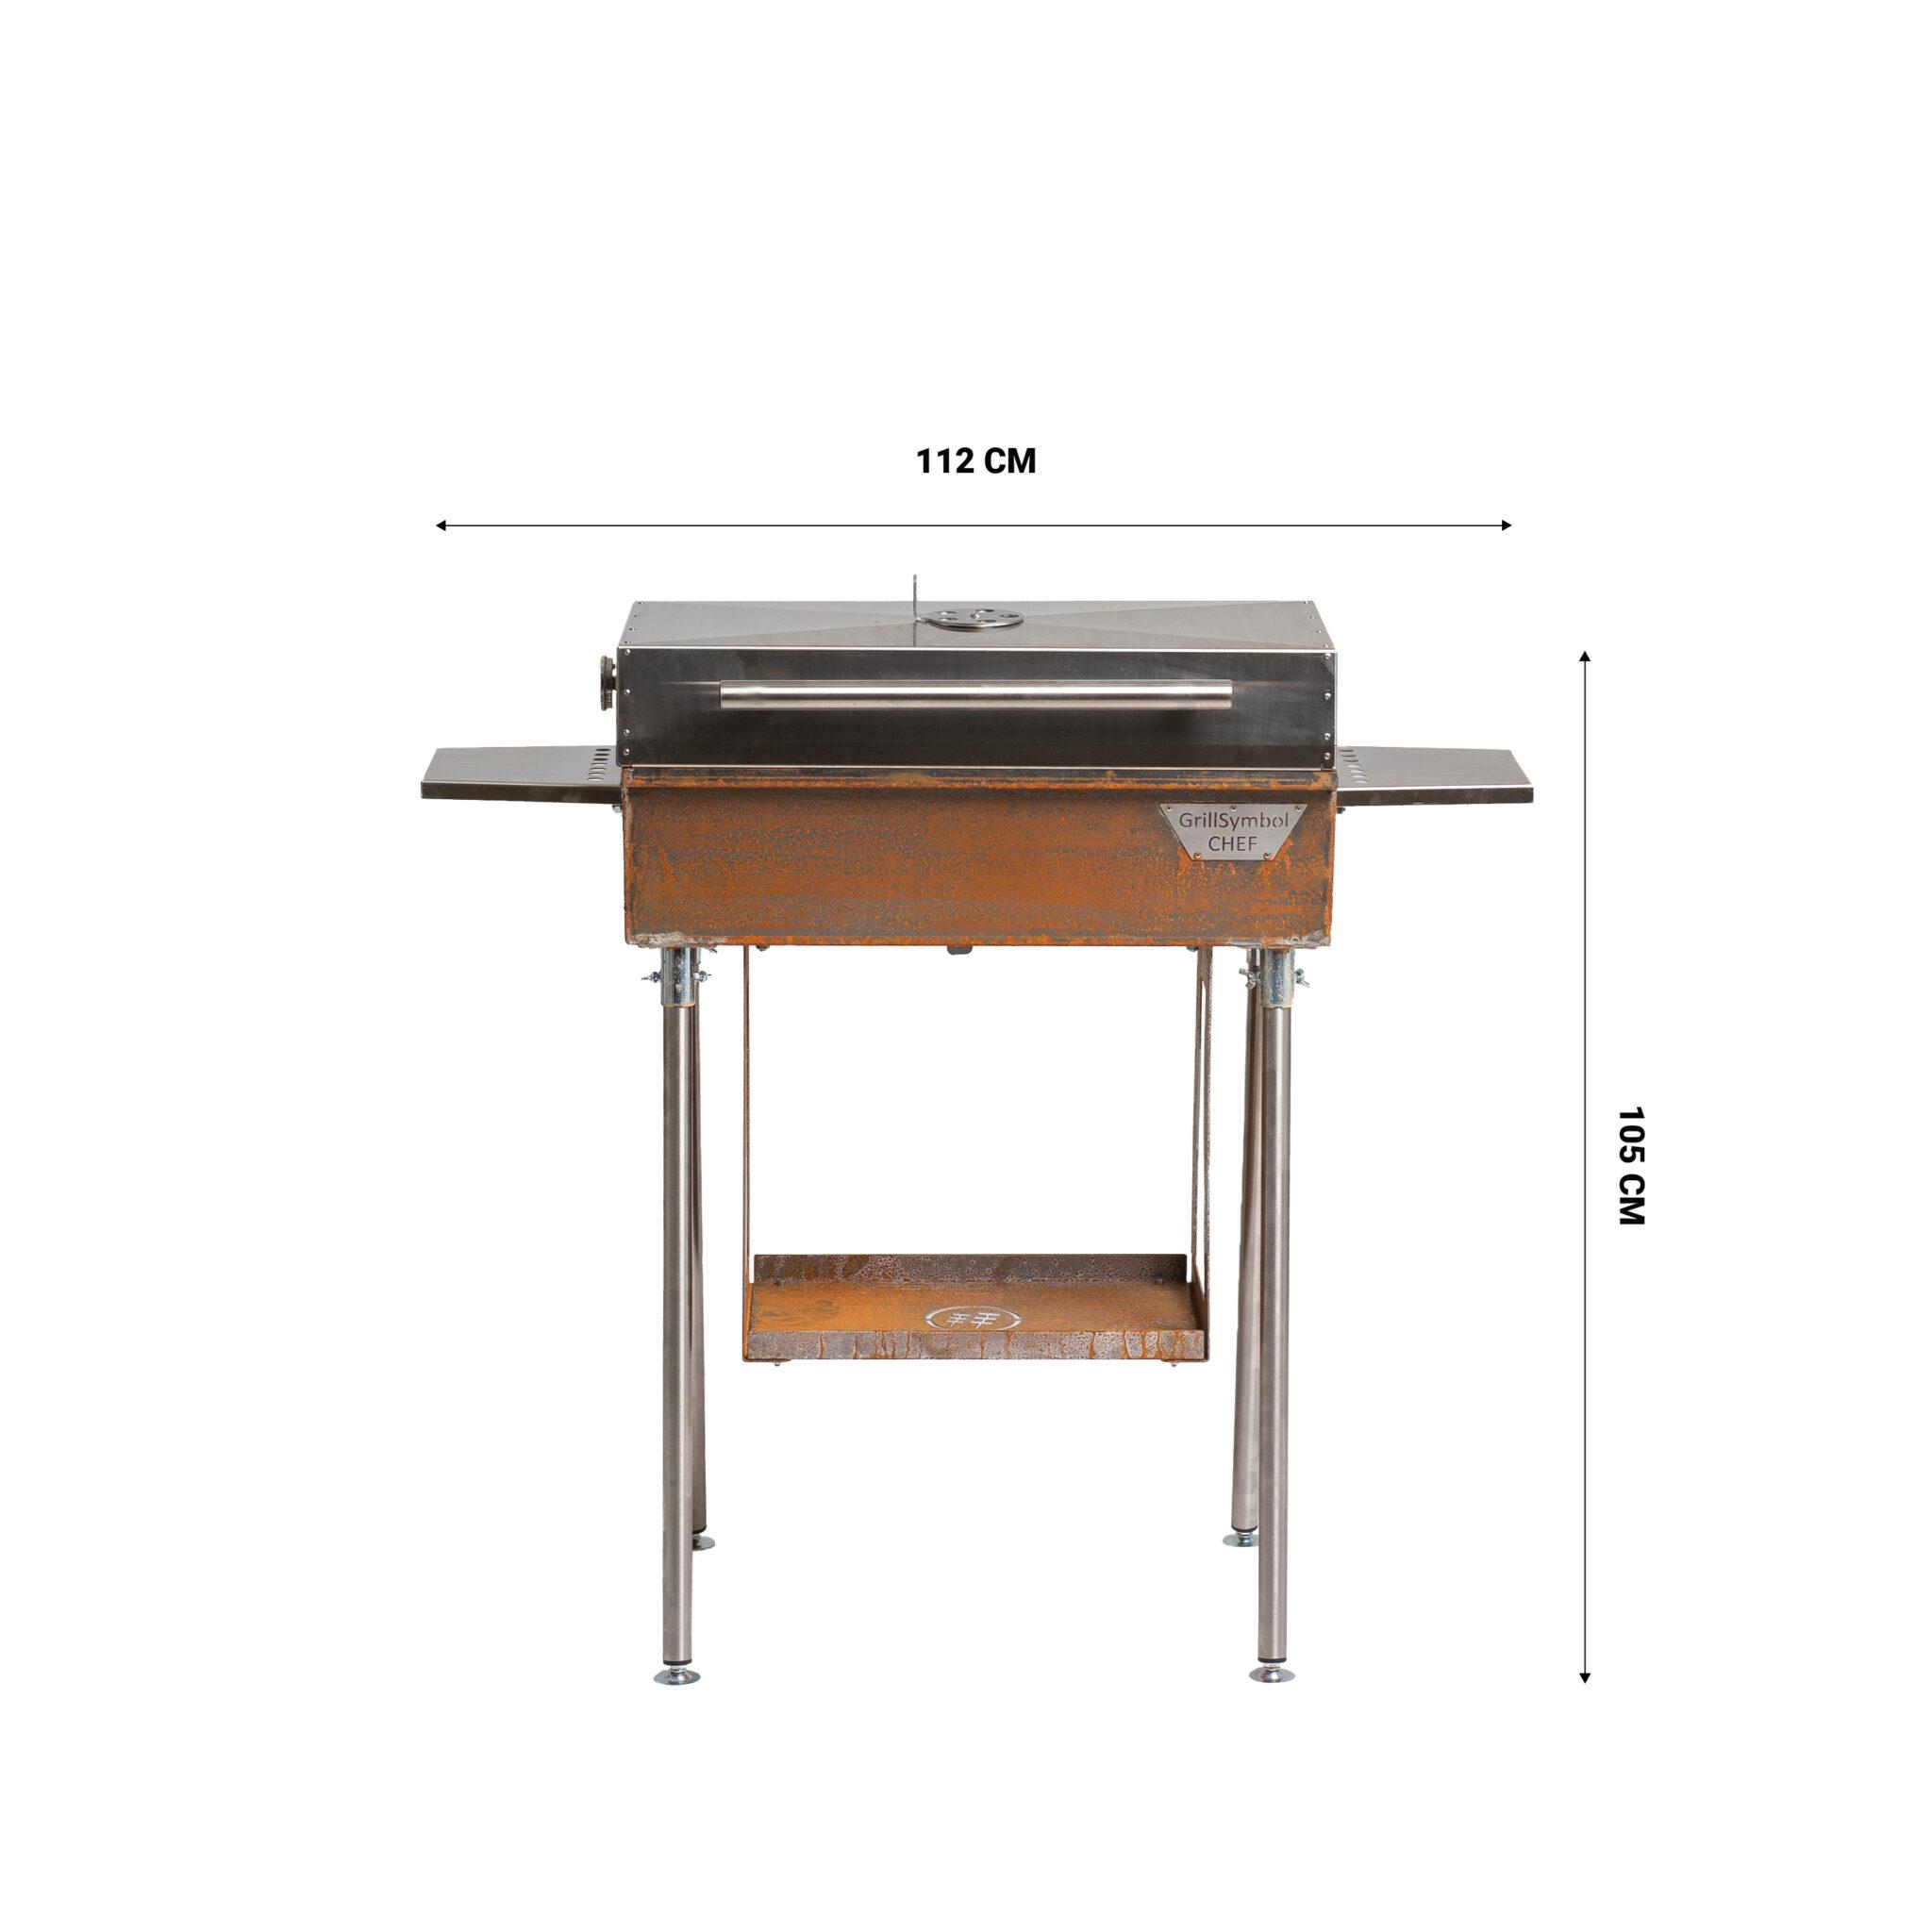 GrillSymbol Chef XL Charcoal BBQ | Etsy